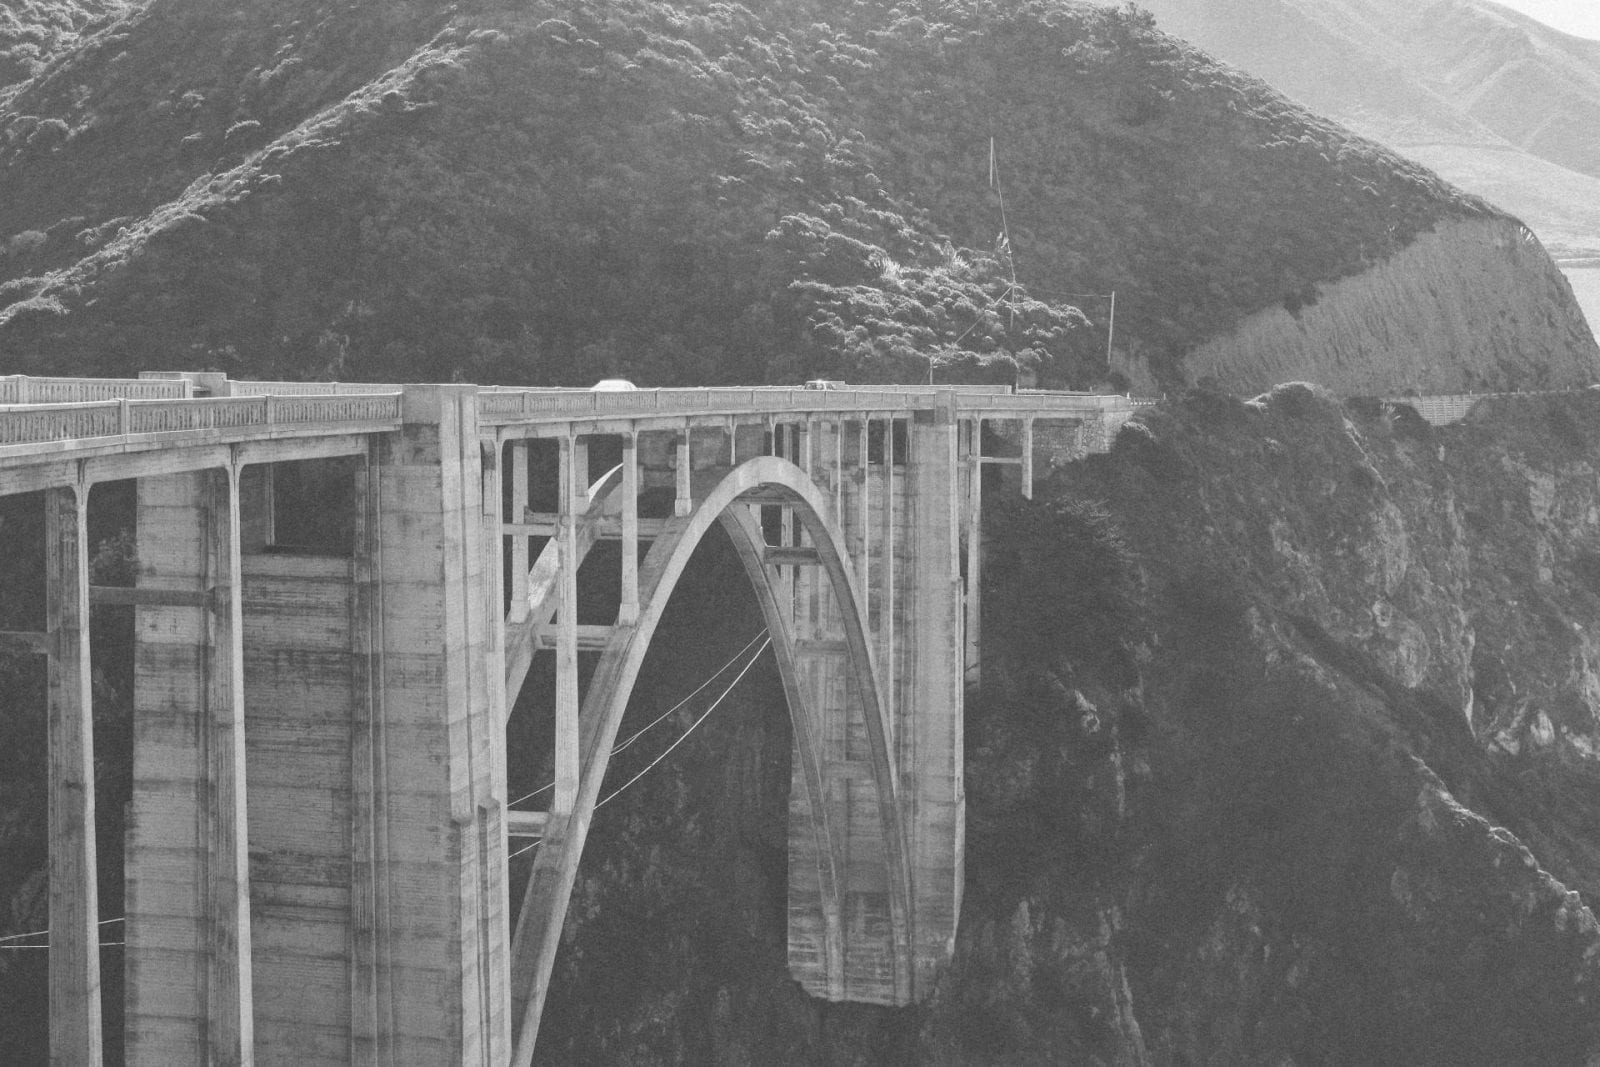 Bixby Creek Bridge in Big Sur